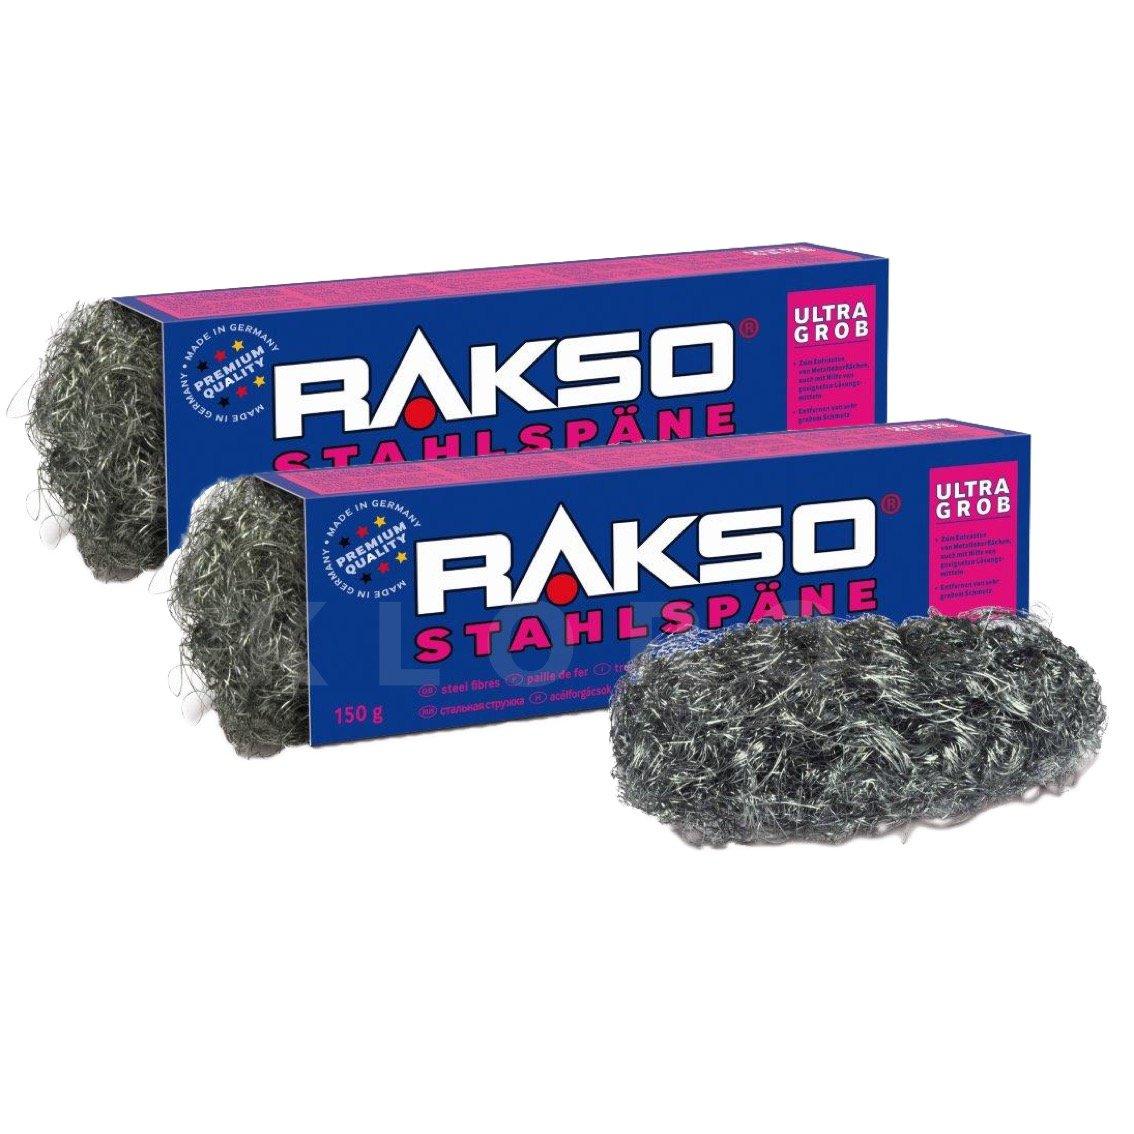 RAKSO® Stahlspäne Sorte ultragrob 2 Pakete mit 150 g 030403